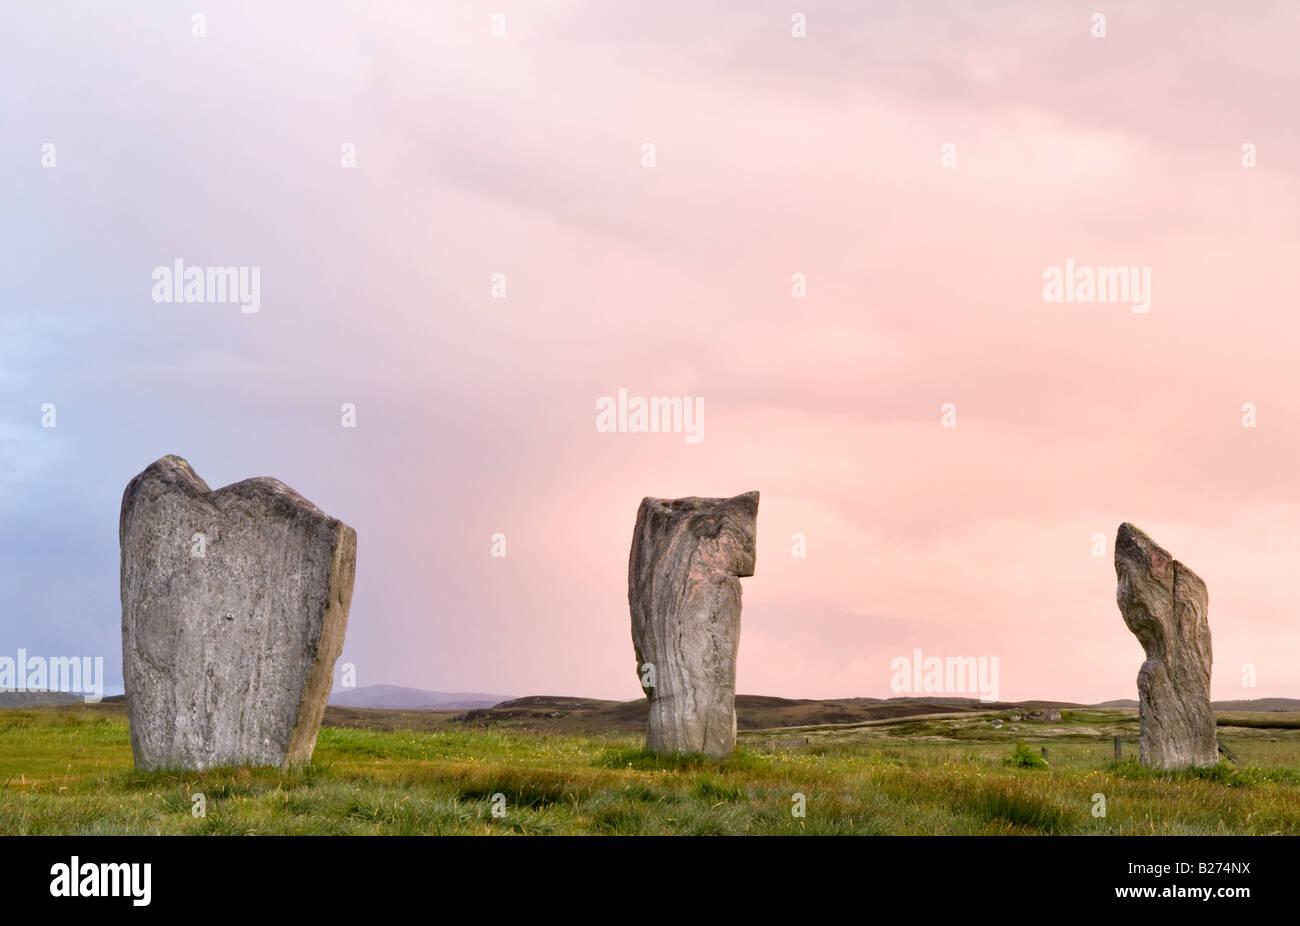 Callanish Standing Stones at dawn, Isle of Lewis, Hebrides, Scotland, UK Stock Photo